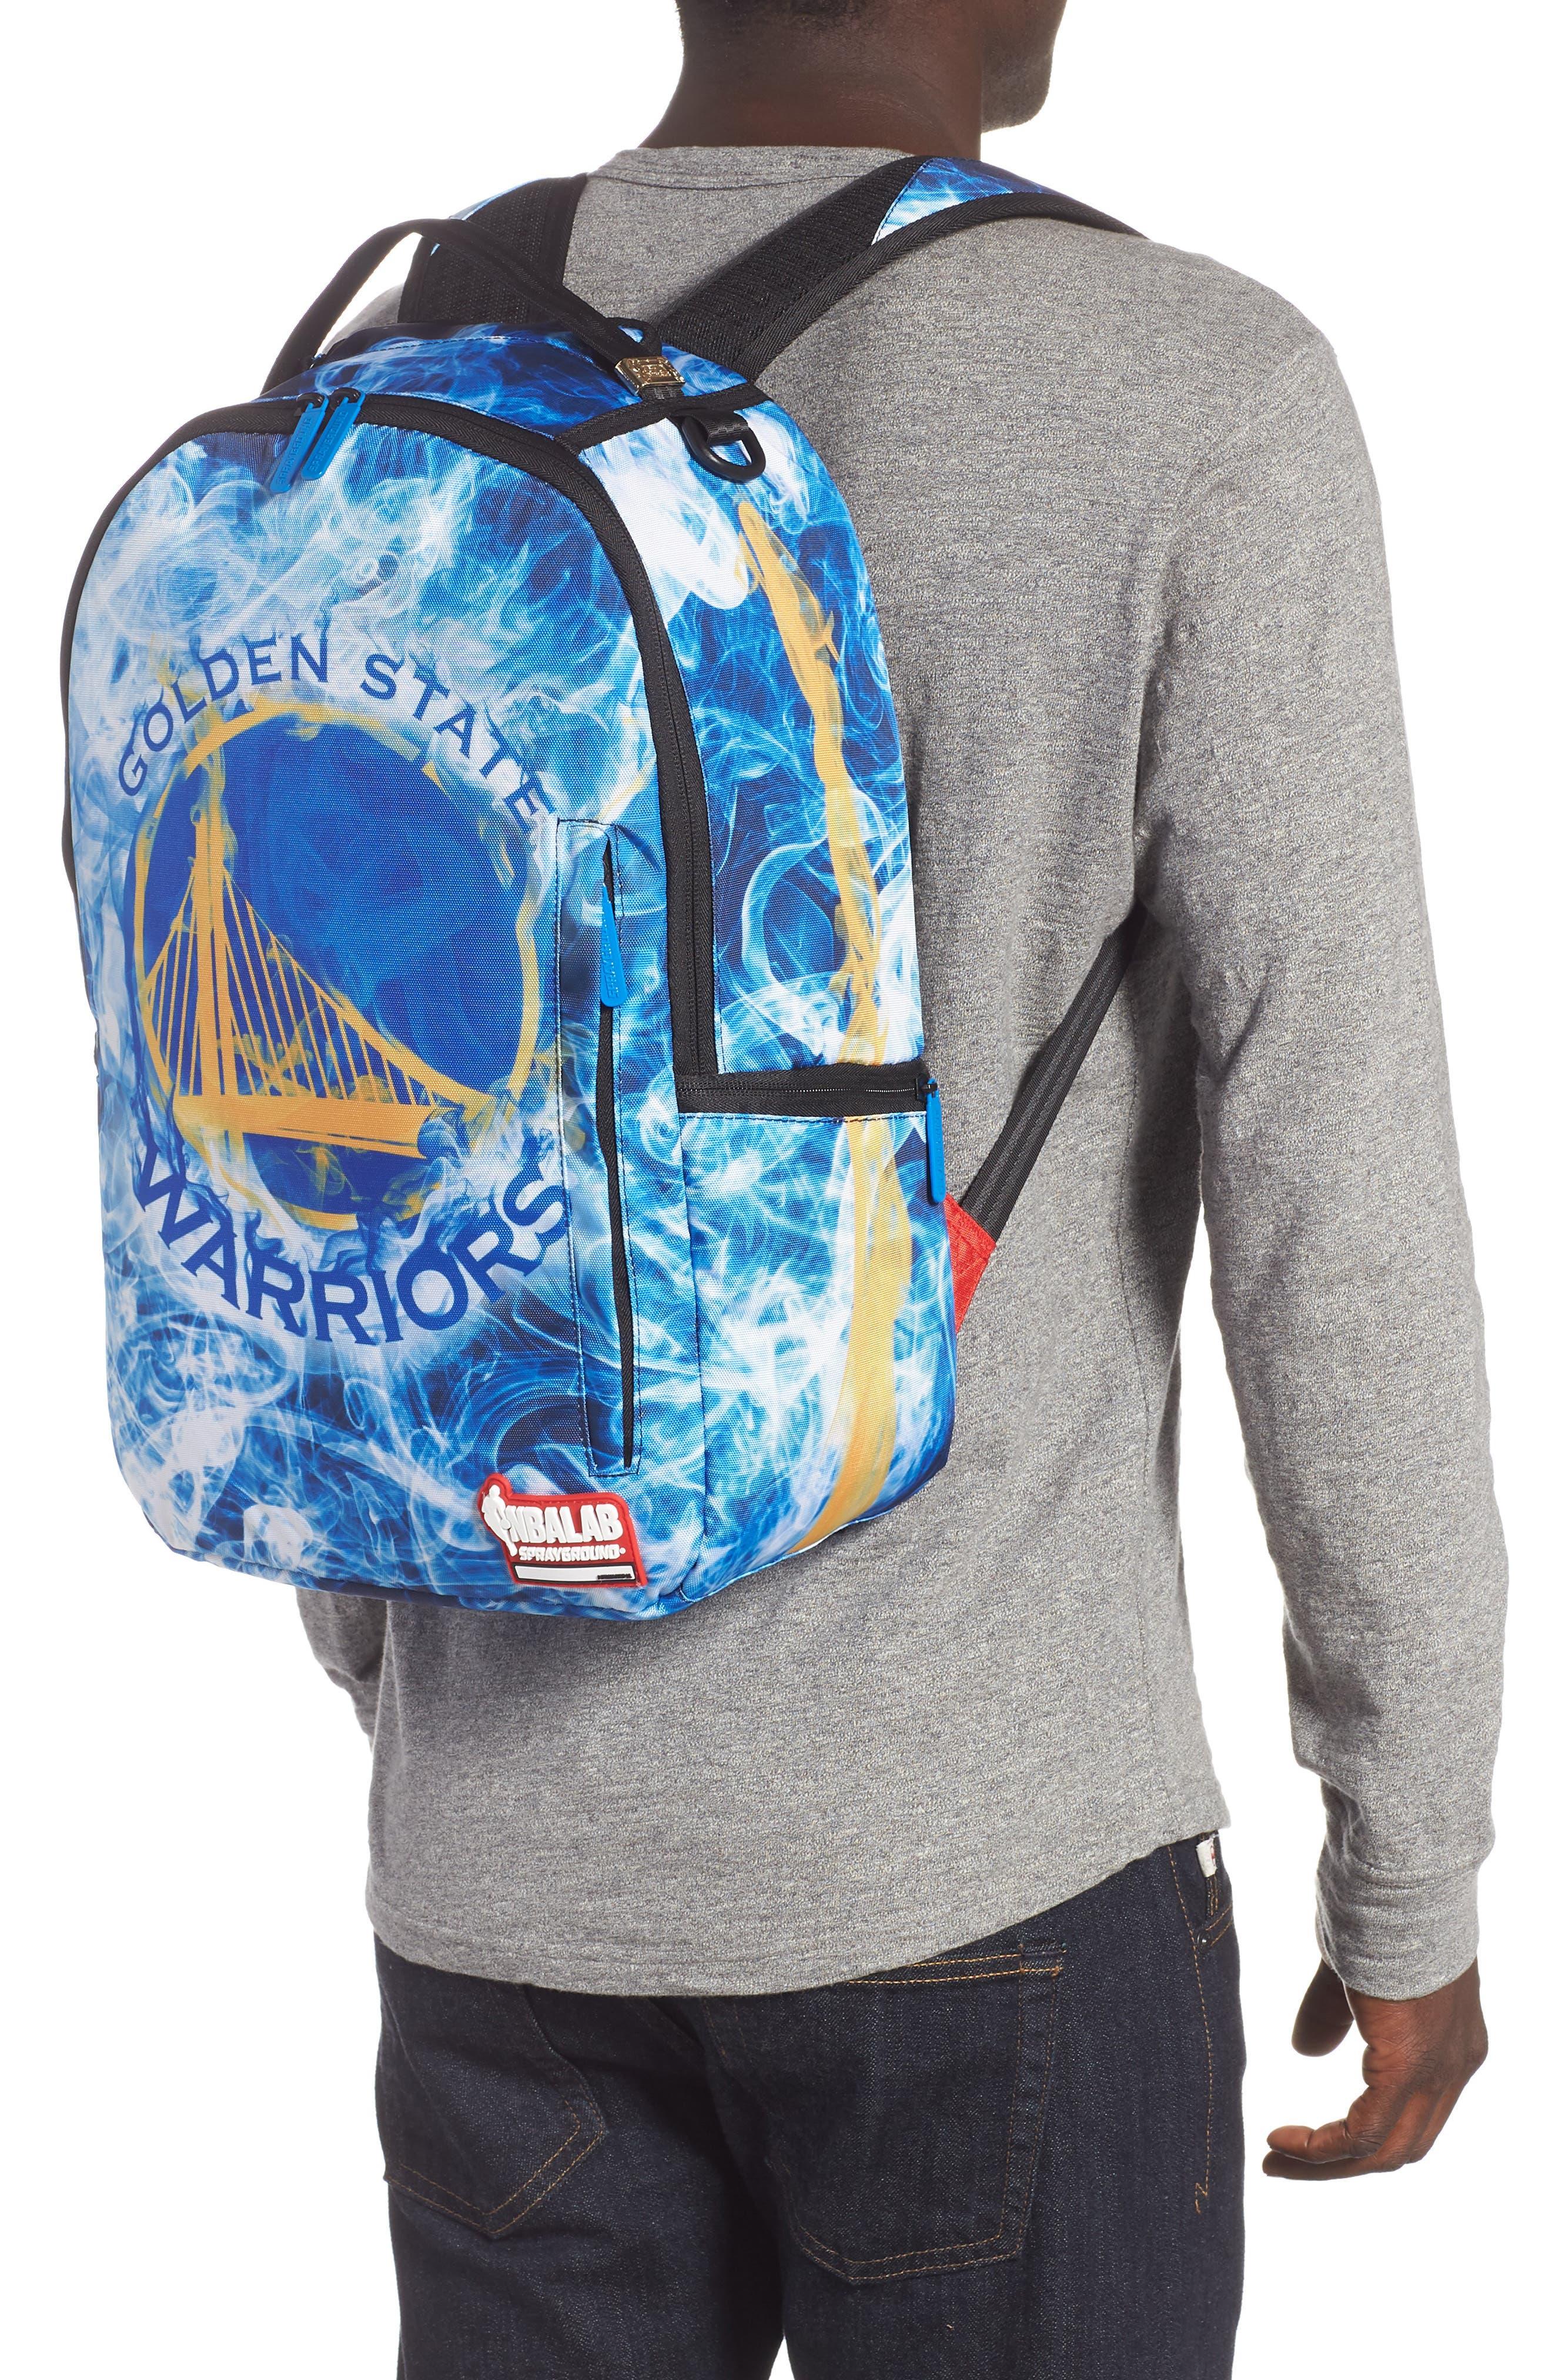 Golden State Smoke Backpack,                             Alternate thumbnail 2, color,                             Blue